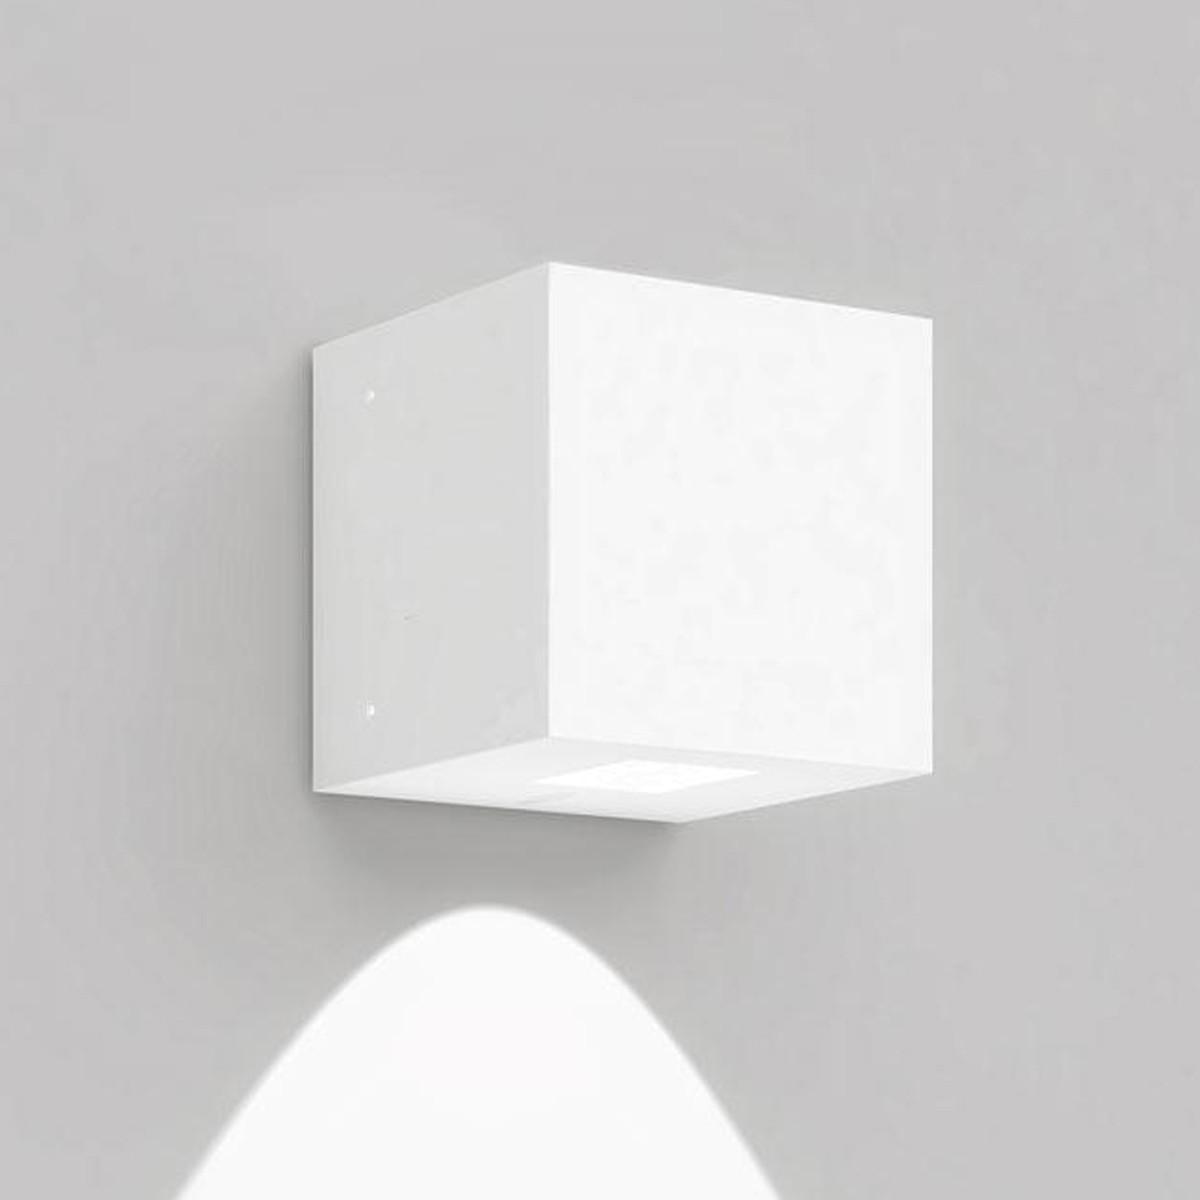 Artemide Outdoor Effetto 14S LED 1L Wandleuchte, 1 x 50°, 3000 K, hellgrau